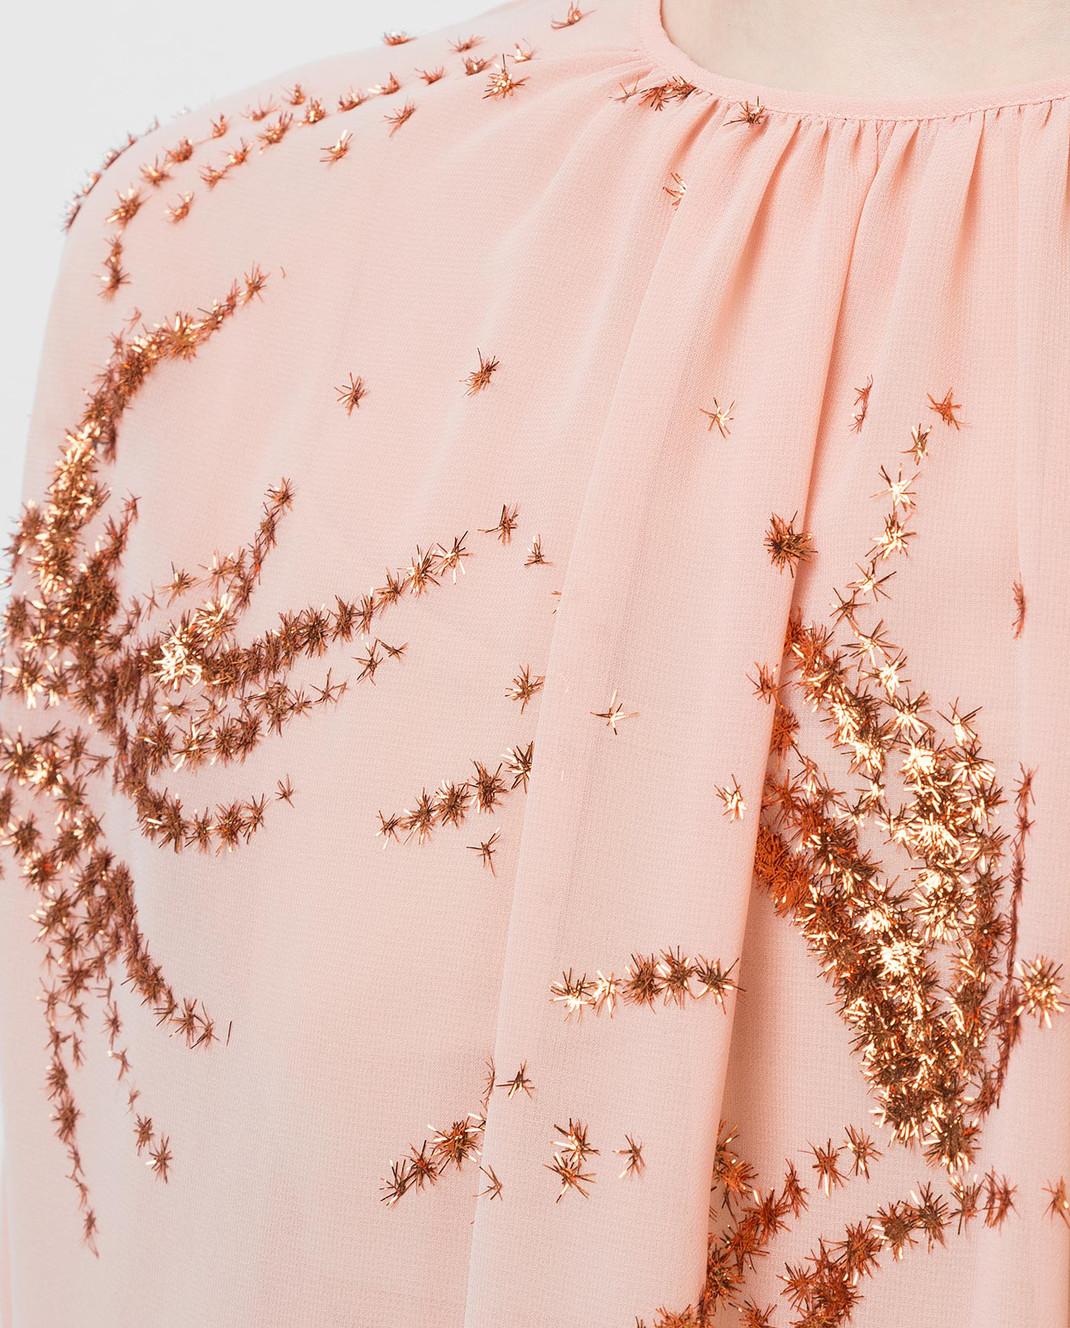 Miu Miu Пудровая блуза MT1296 изображение 5